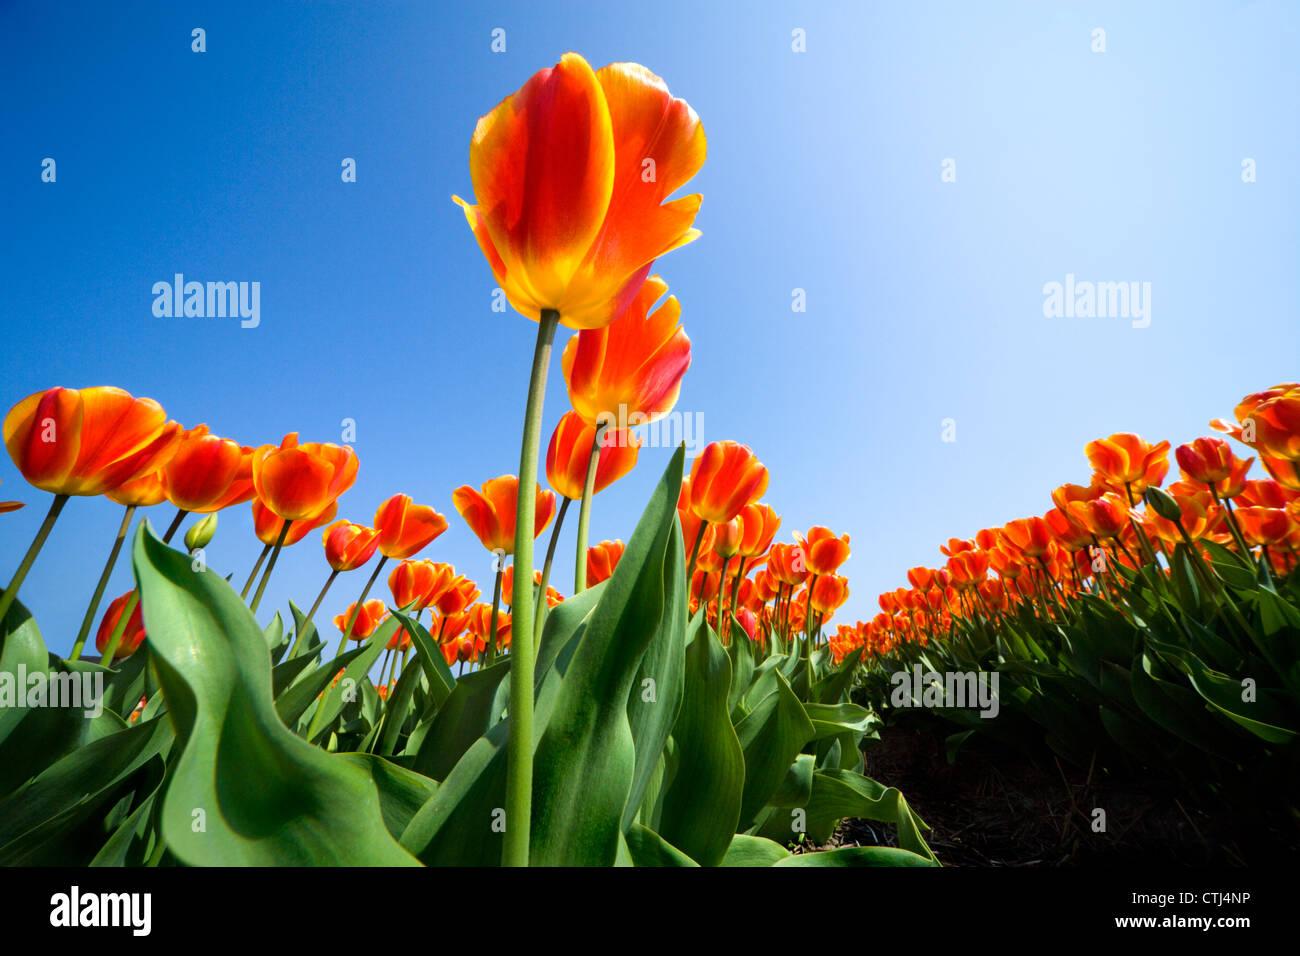 https://c7.alamy.com/comp/CTJ4NP/holland-tulips-netherlands-tulips-dutch-tulips-rows-of-vibrant-orange-CTJ4NP.jpg